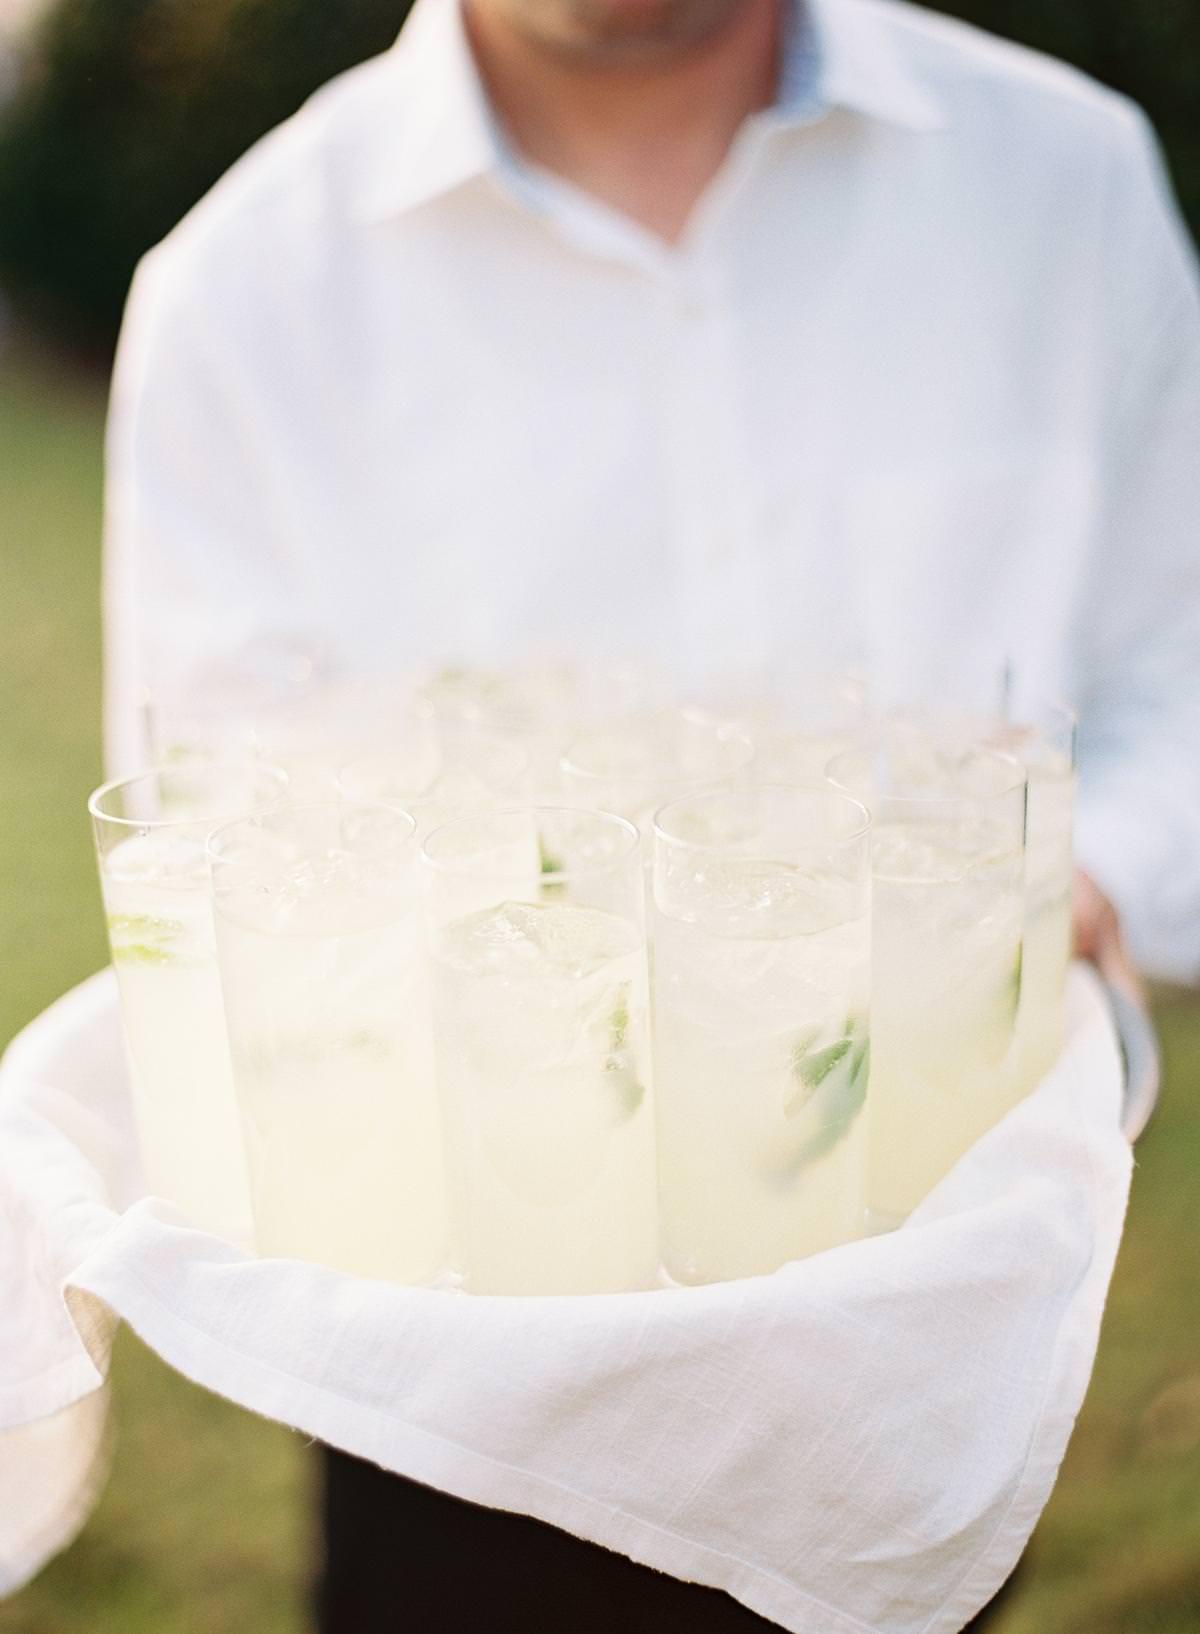 butler passed lemonade